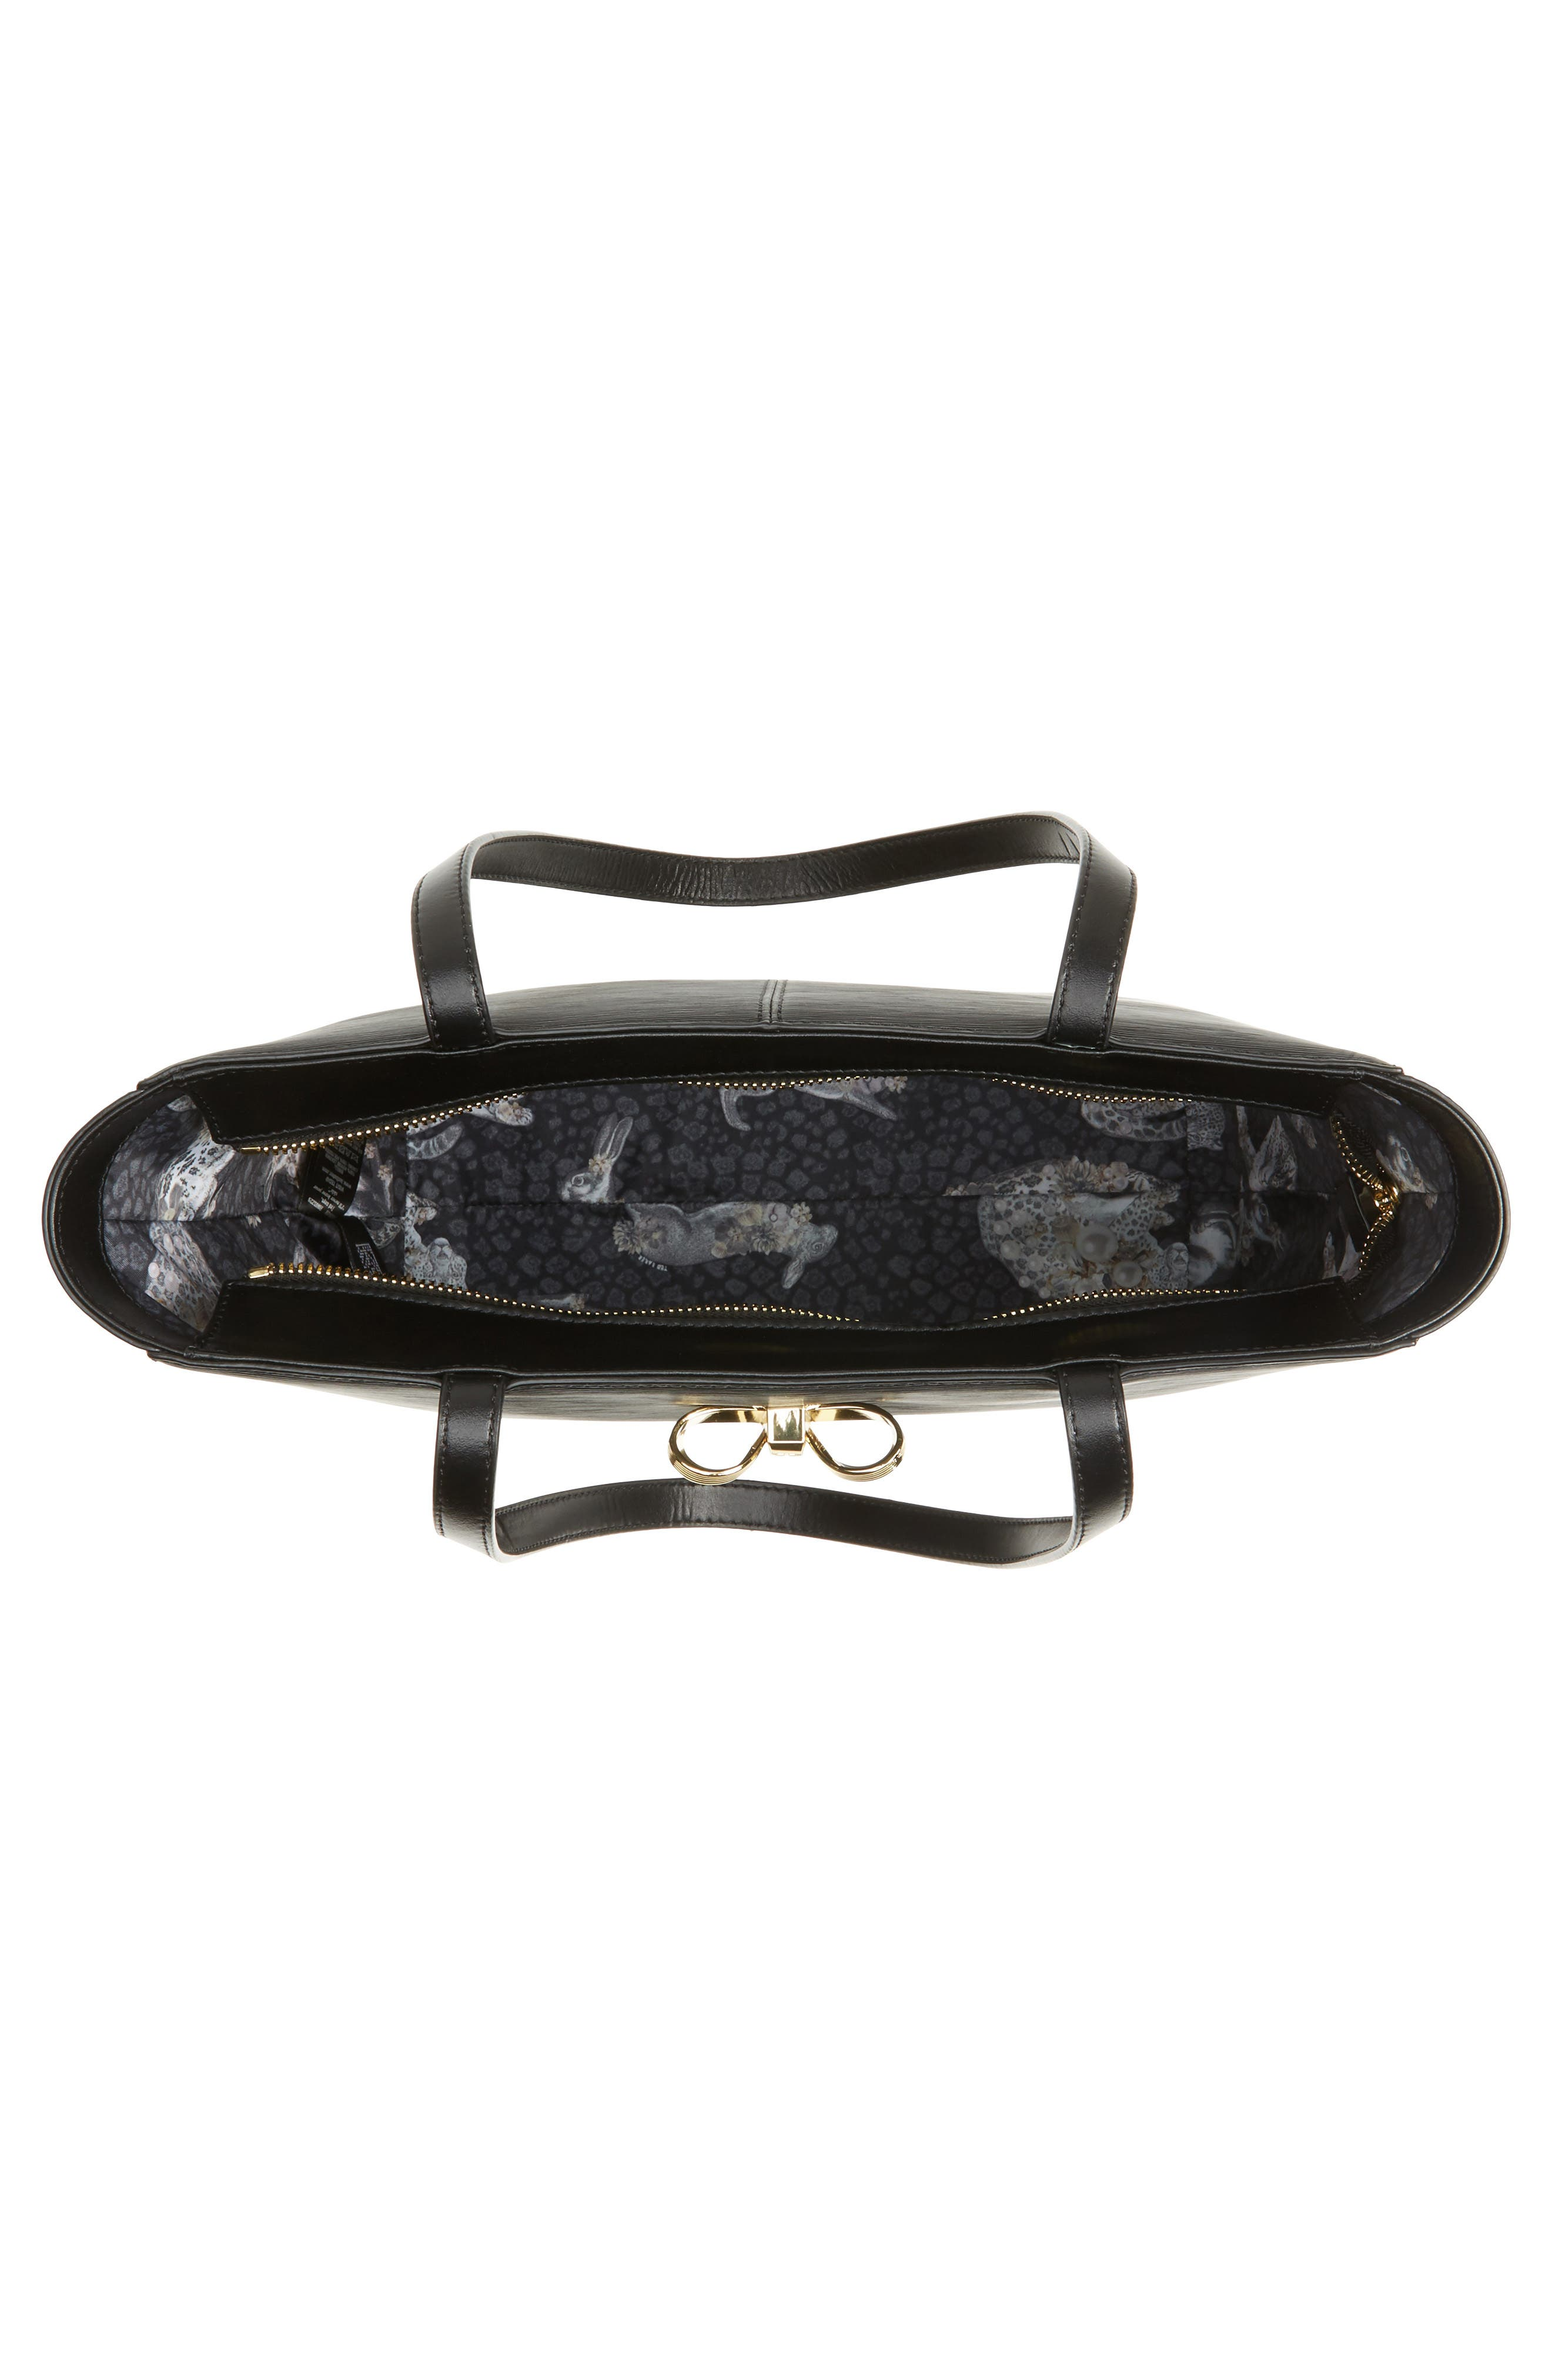 Larah Looped Bow Leather Shopper,                             Alternate thumbnail 4, color,                             001